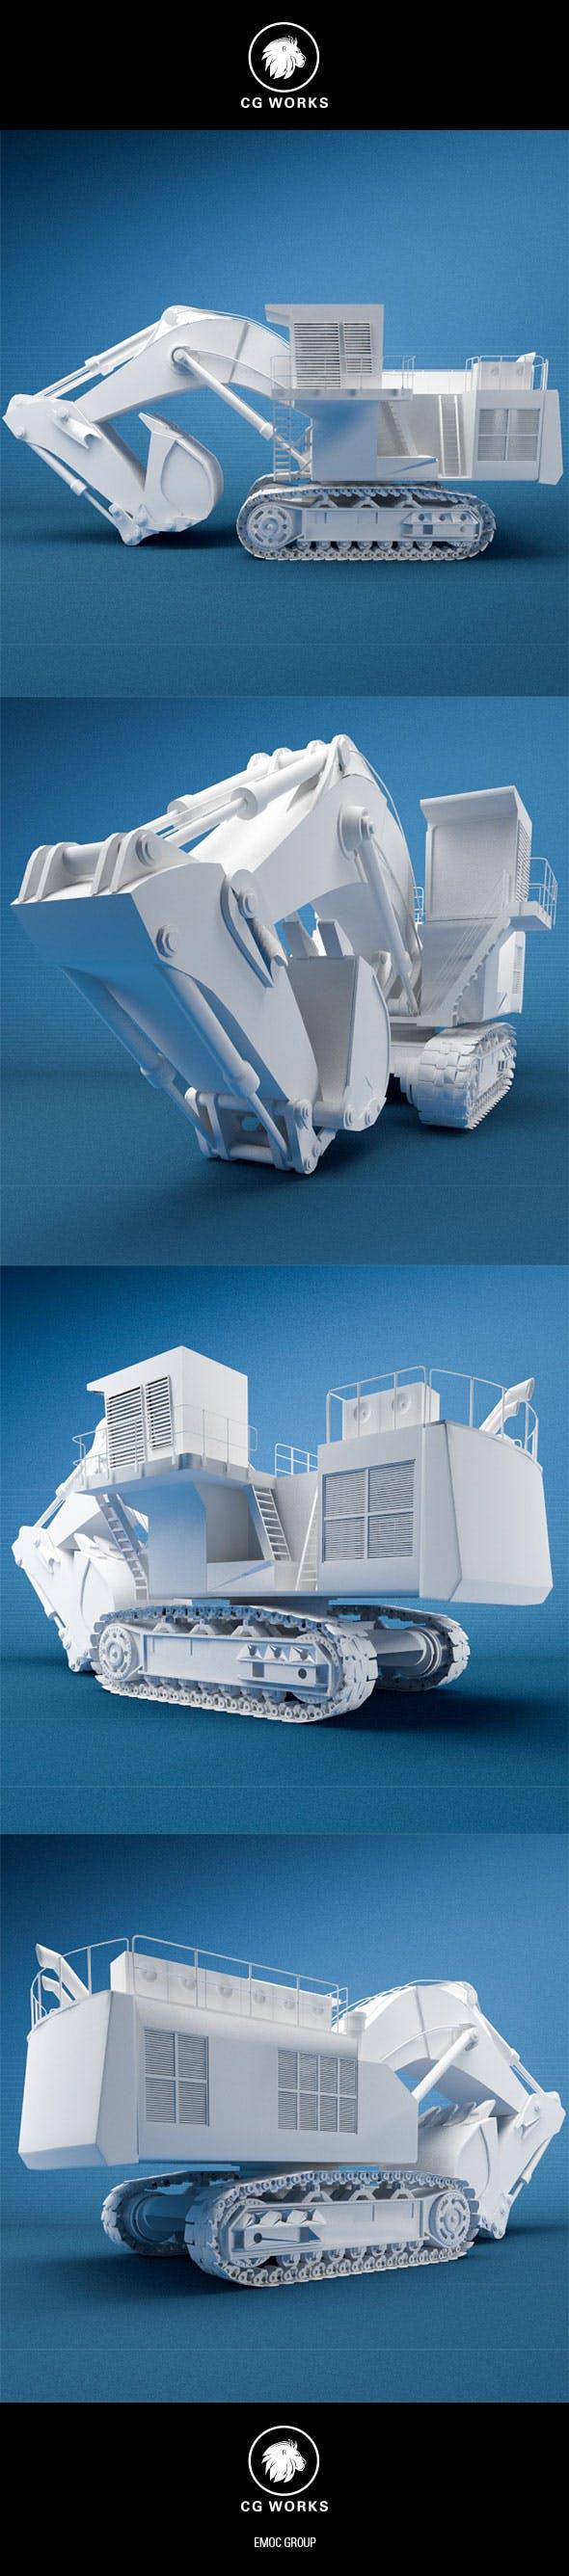 Construction machinery C4D & OBJ XVII - 3DOcean Item for Sale